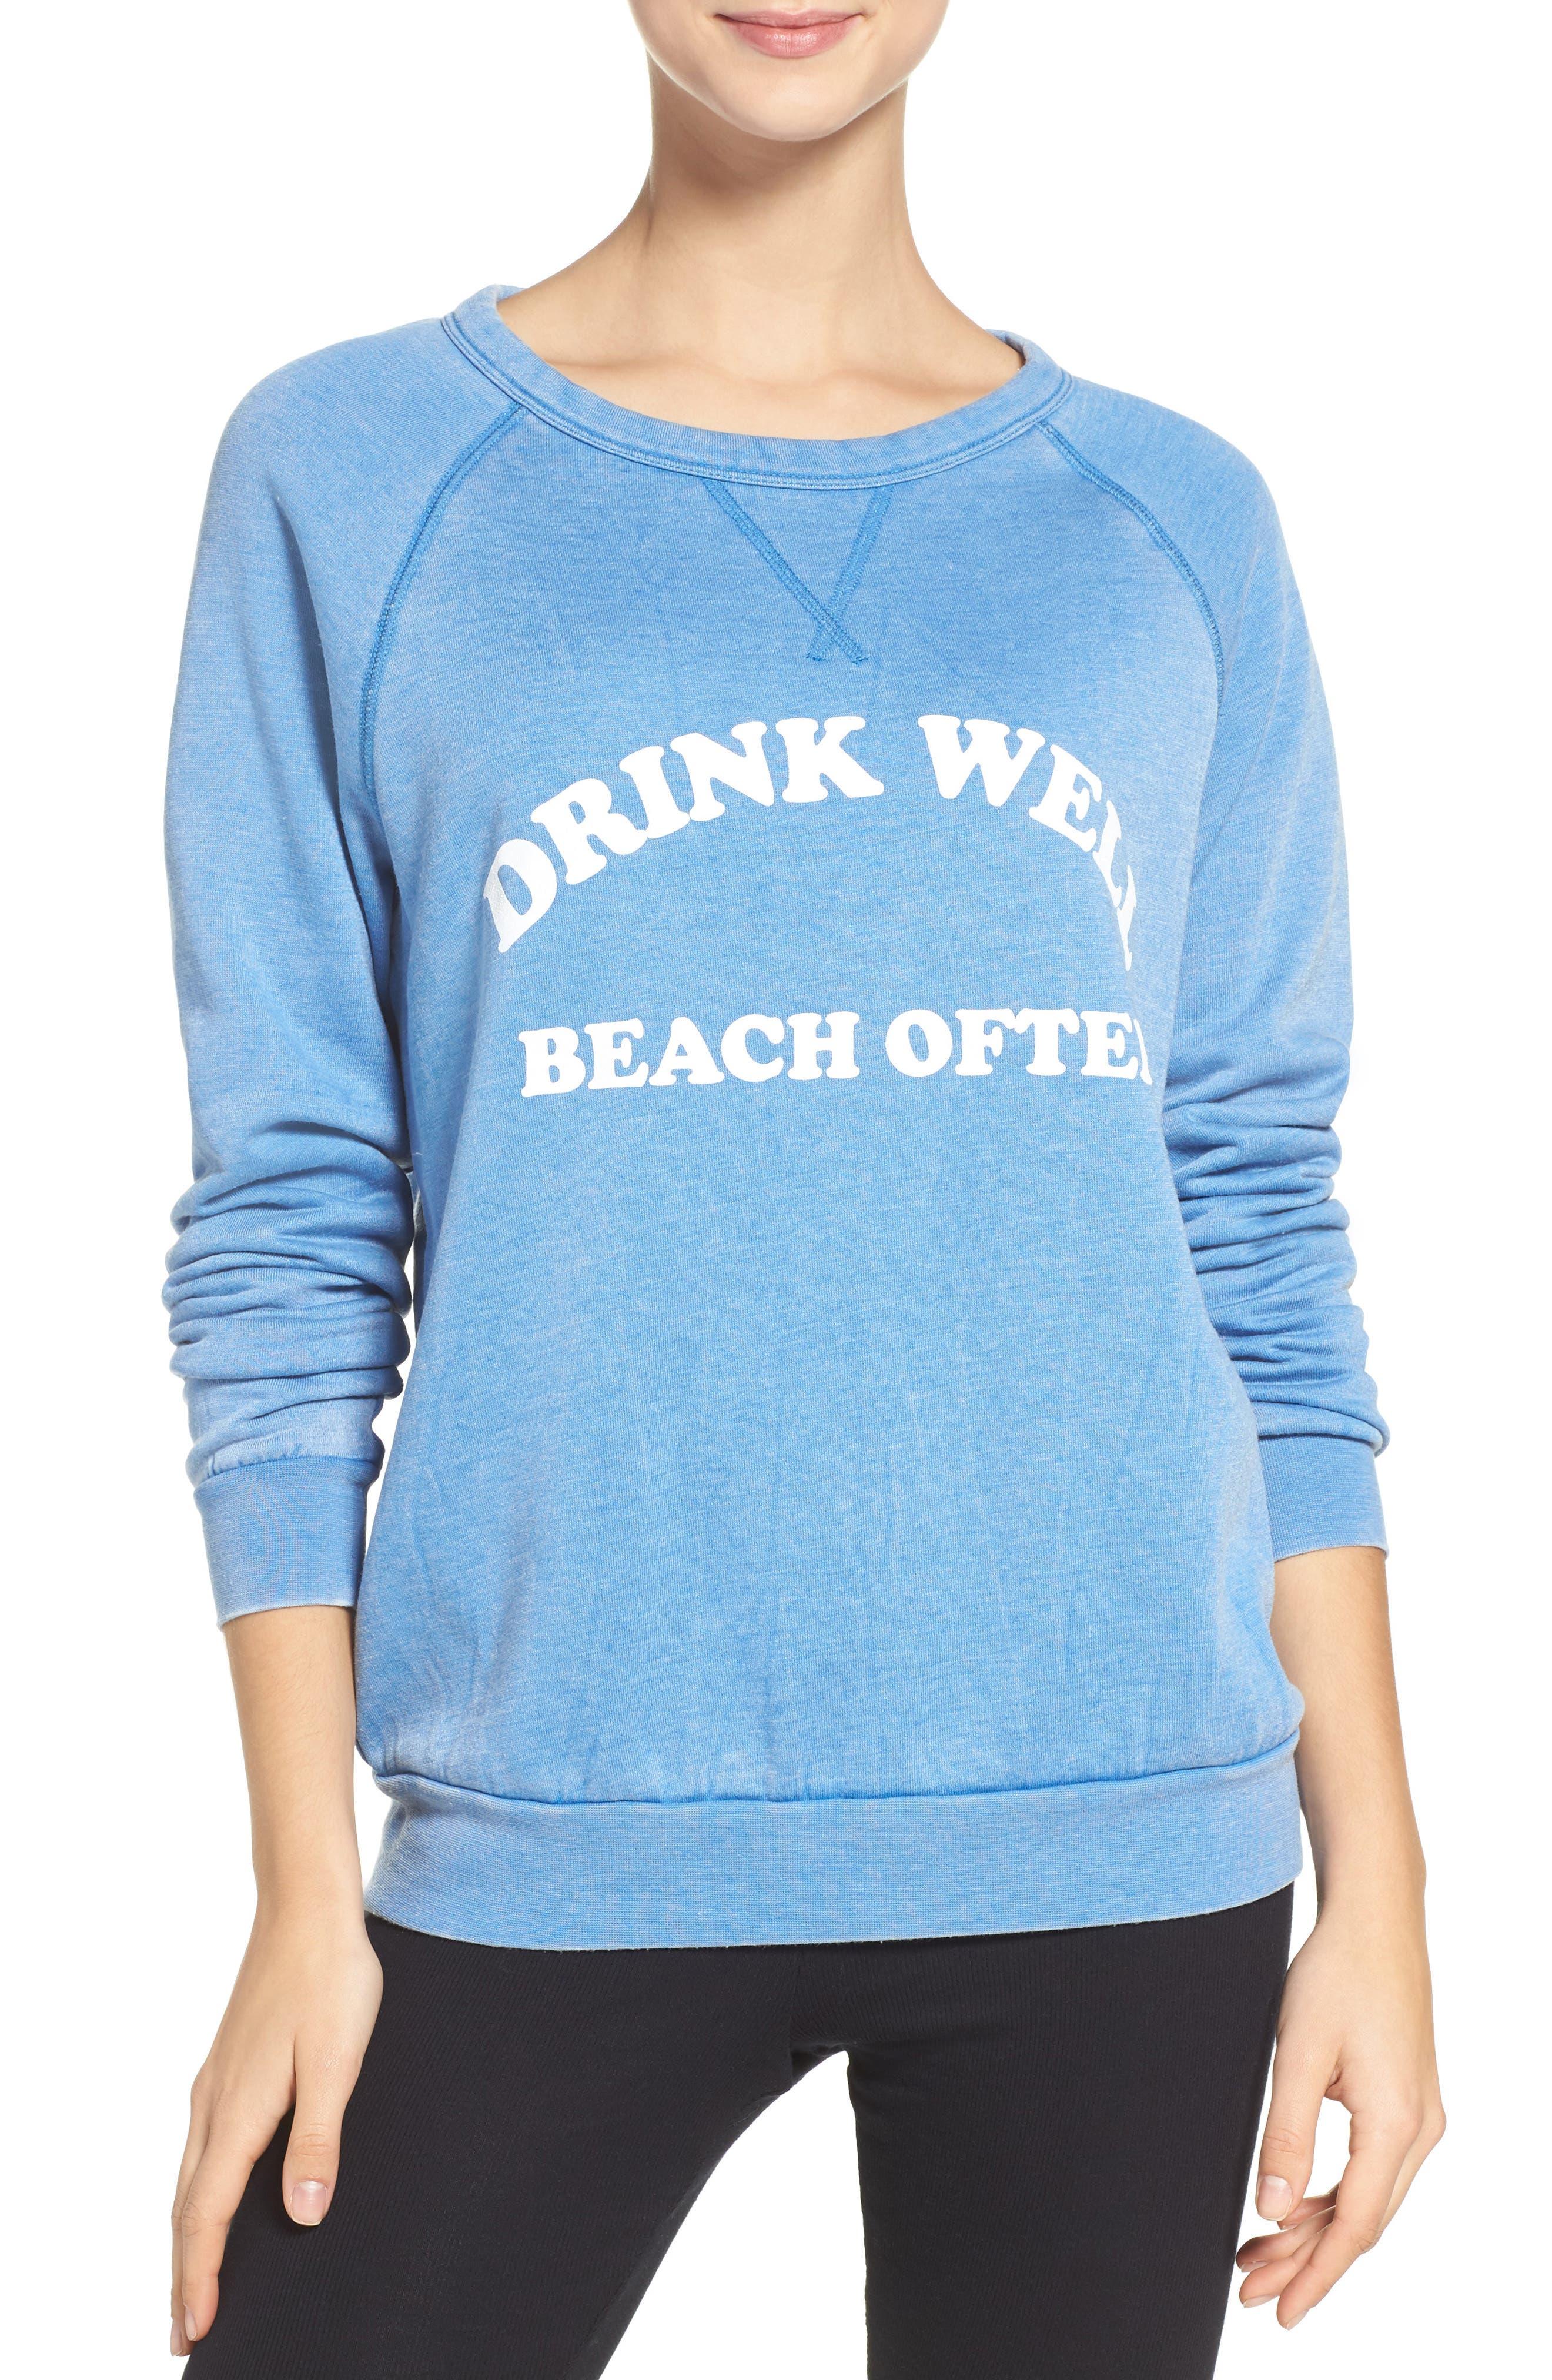 Drink Well Beach Often Sweatshirt,                         Main,                         color, Deep Blue